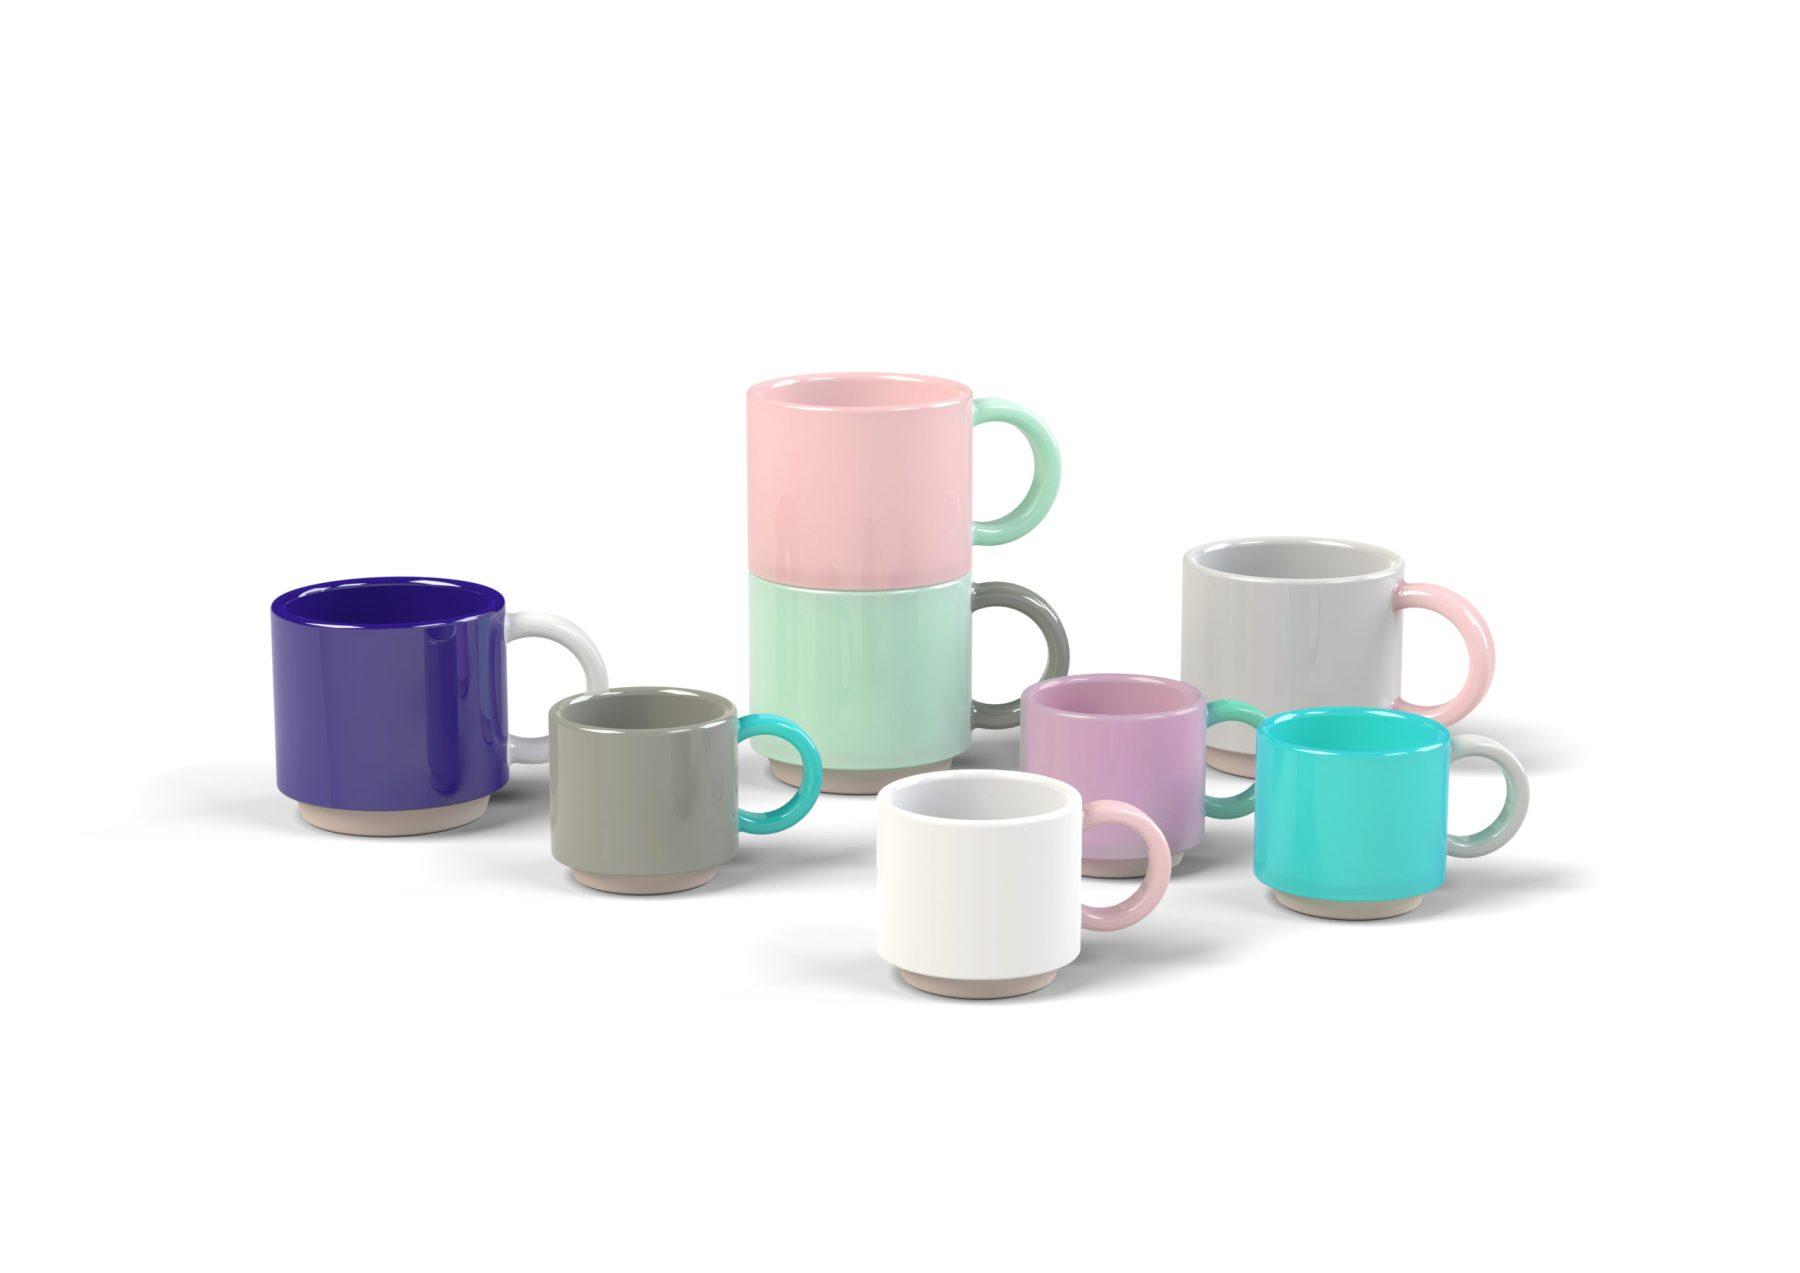 Skittle Stacking and Espresso Mug Group Shot